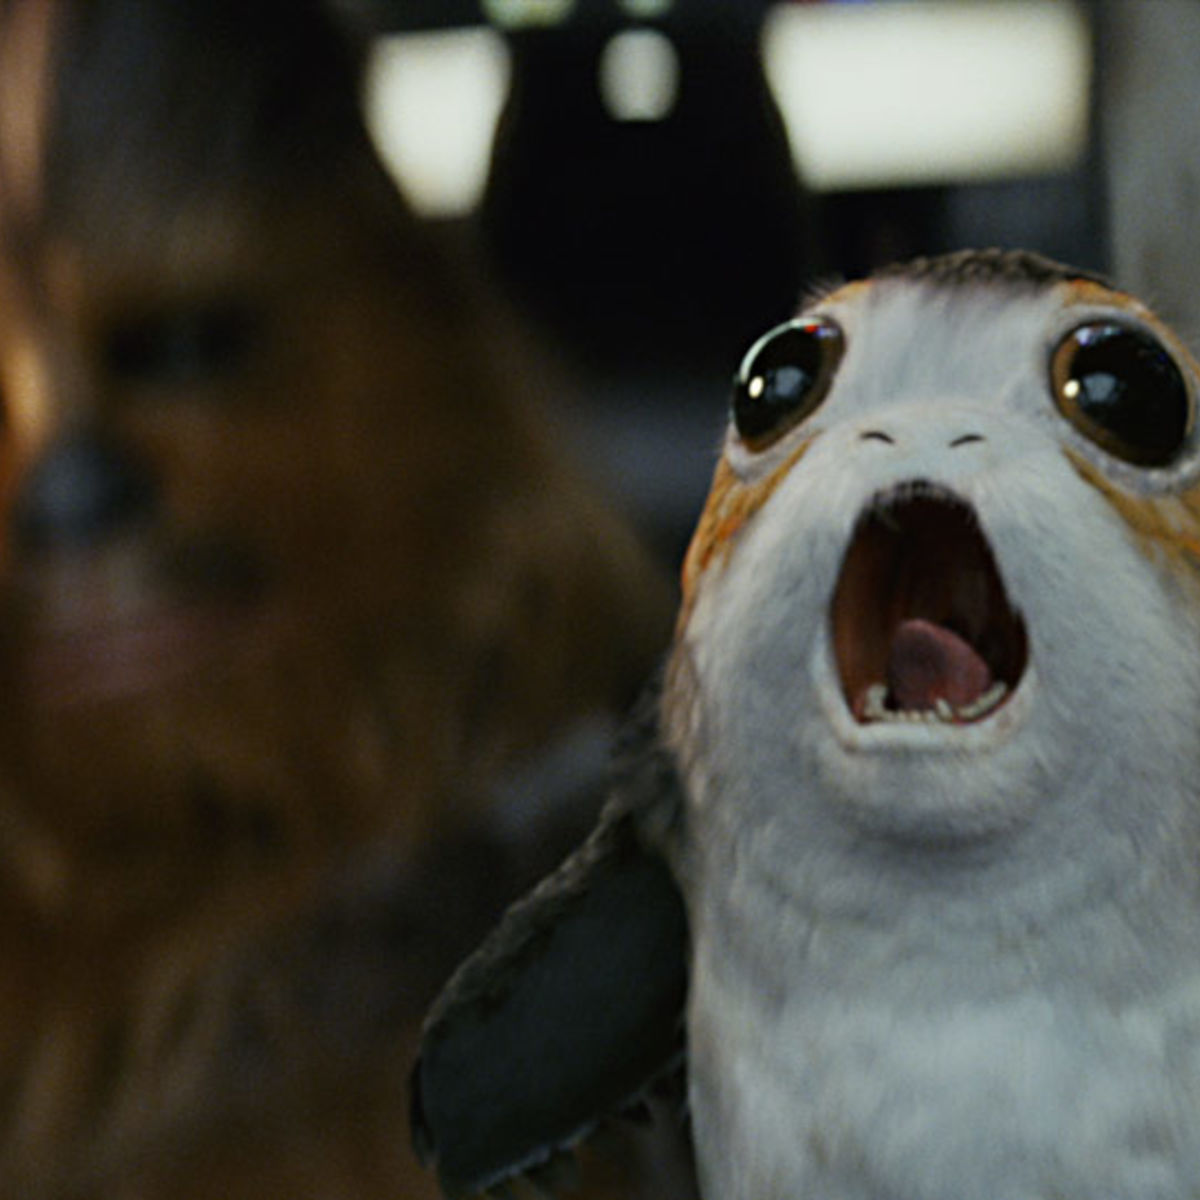 star-wars-the-last-jedi-porg-millenium-falcon-pit-chewie.jpg